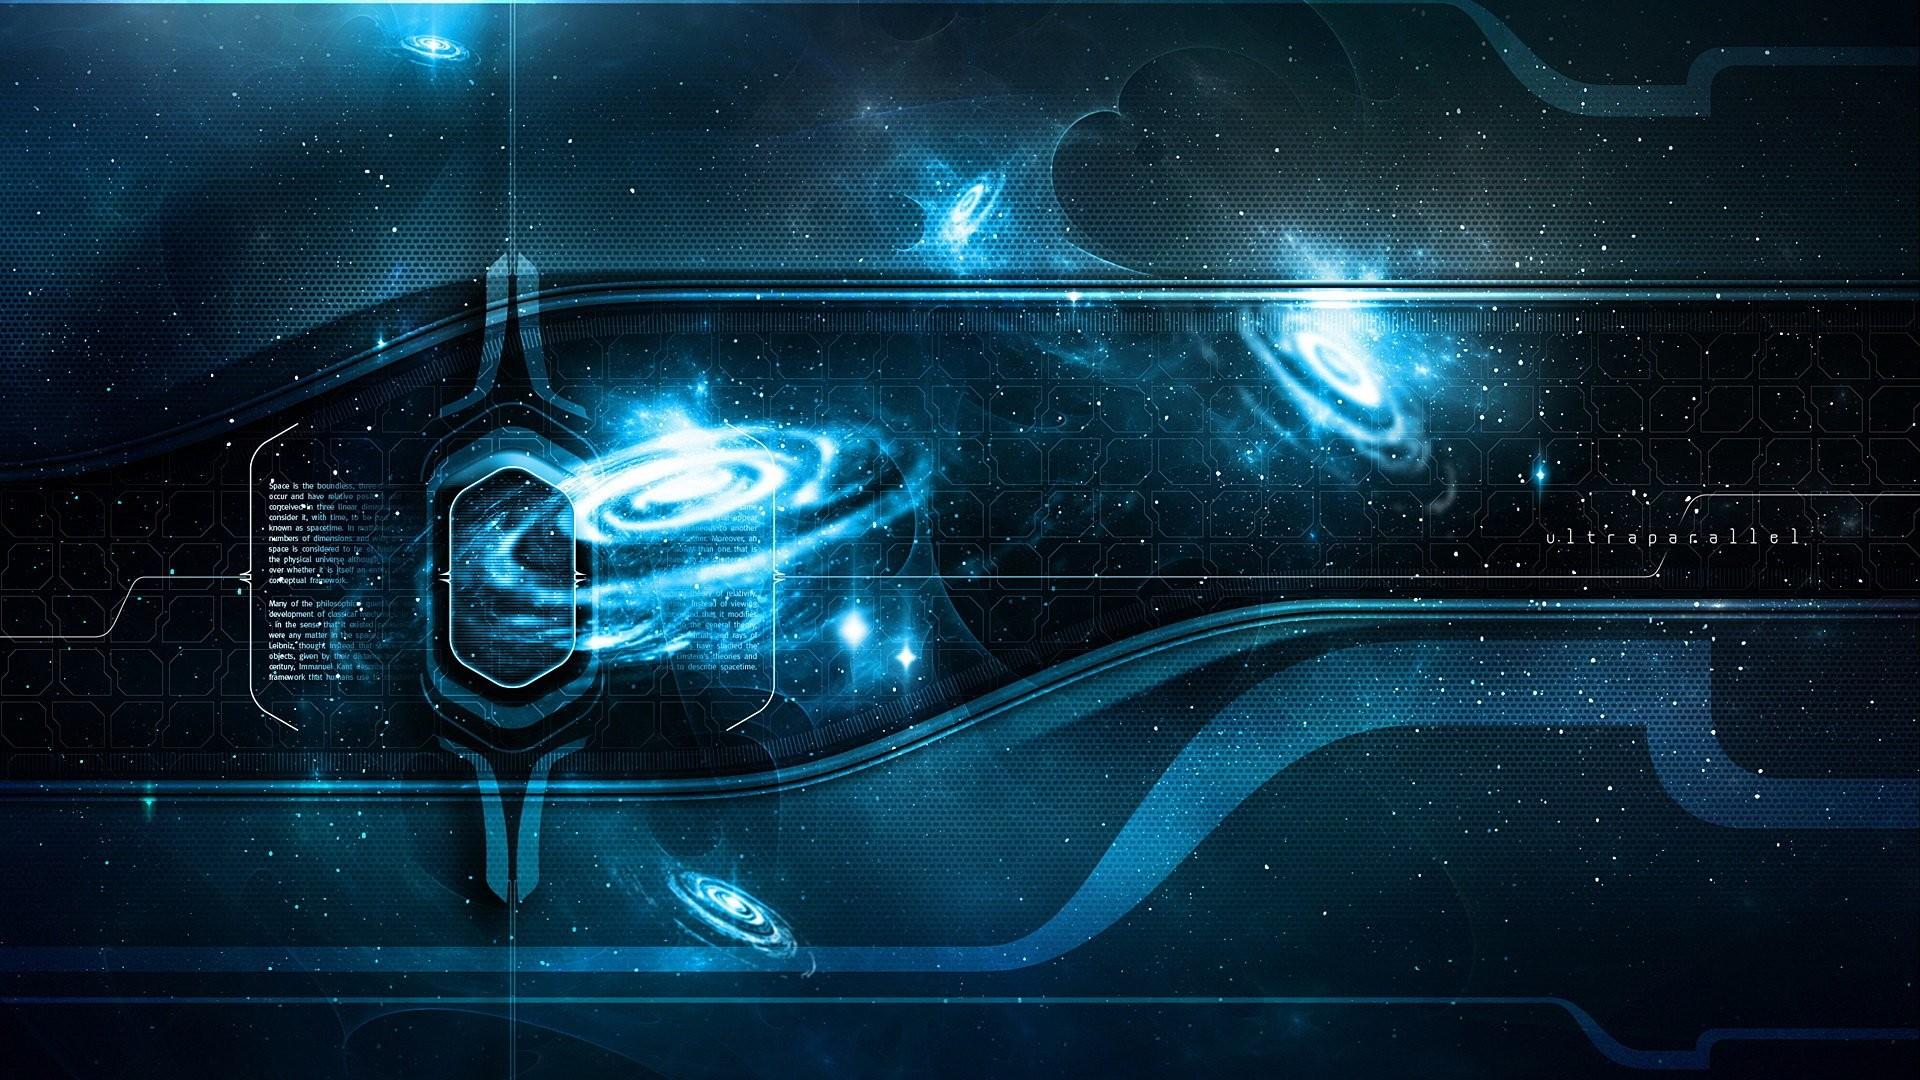 download manifest destiny westward expansion milestones in